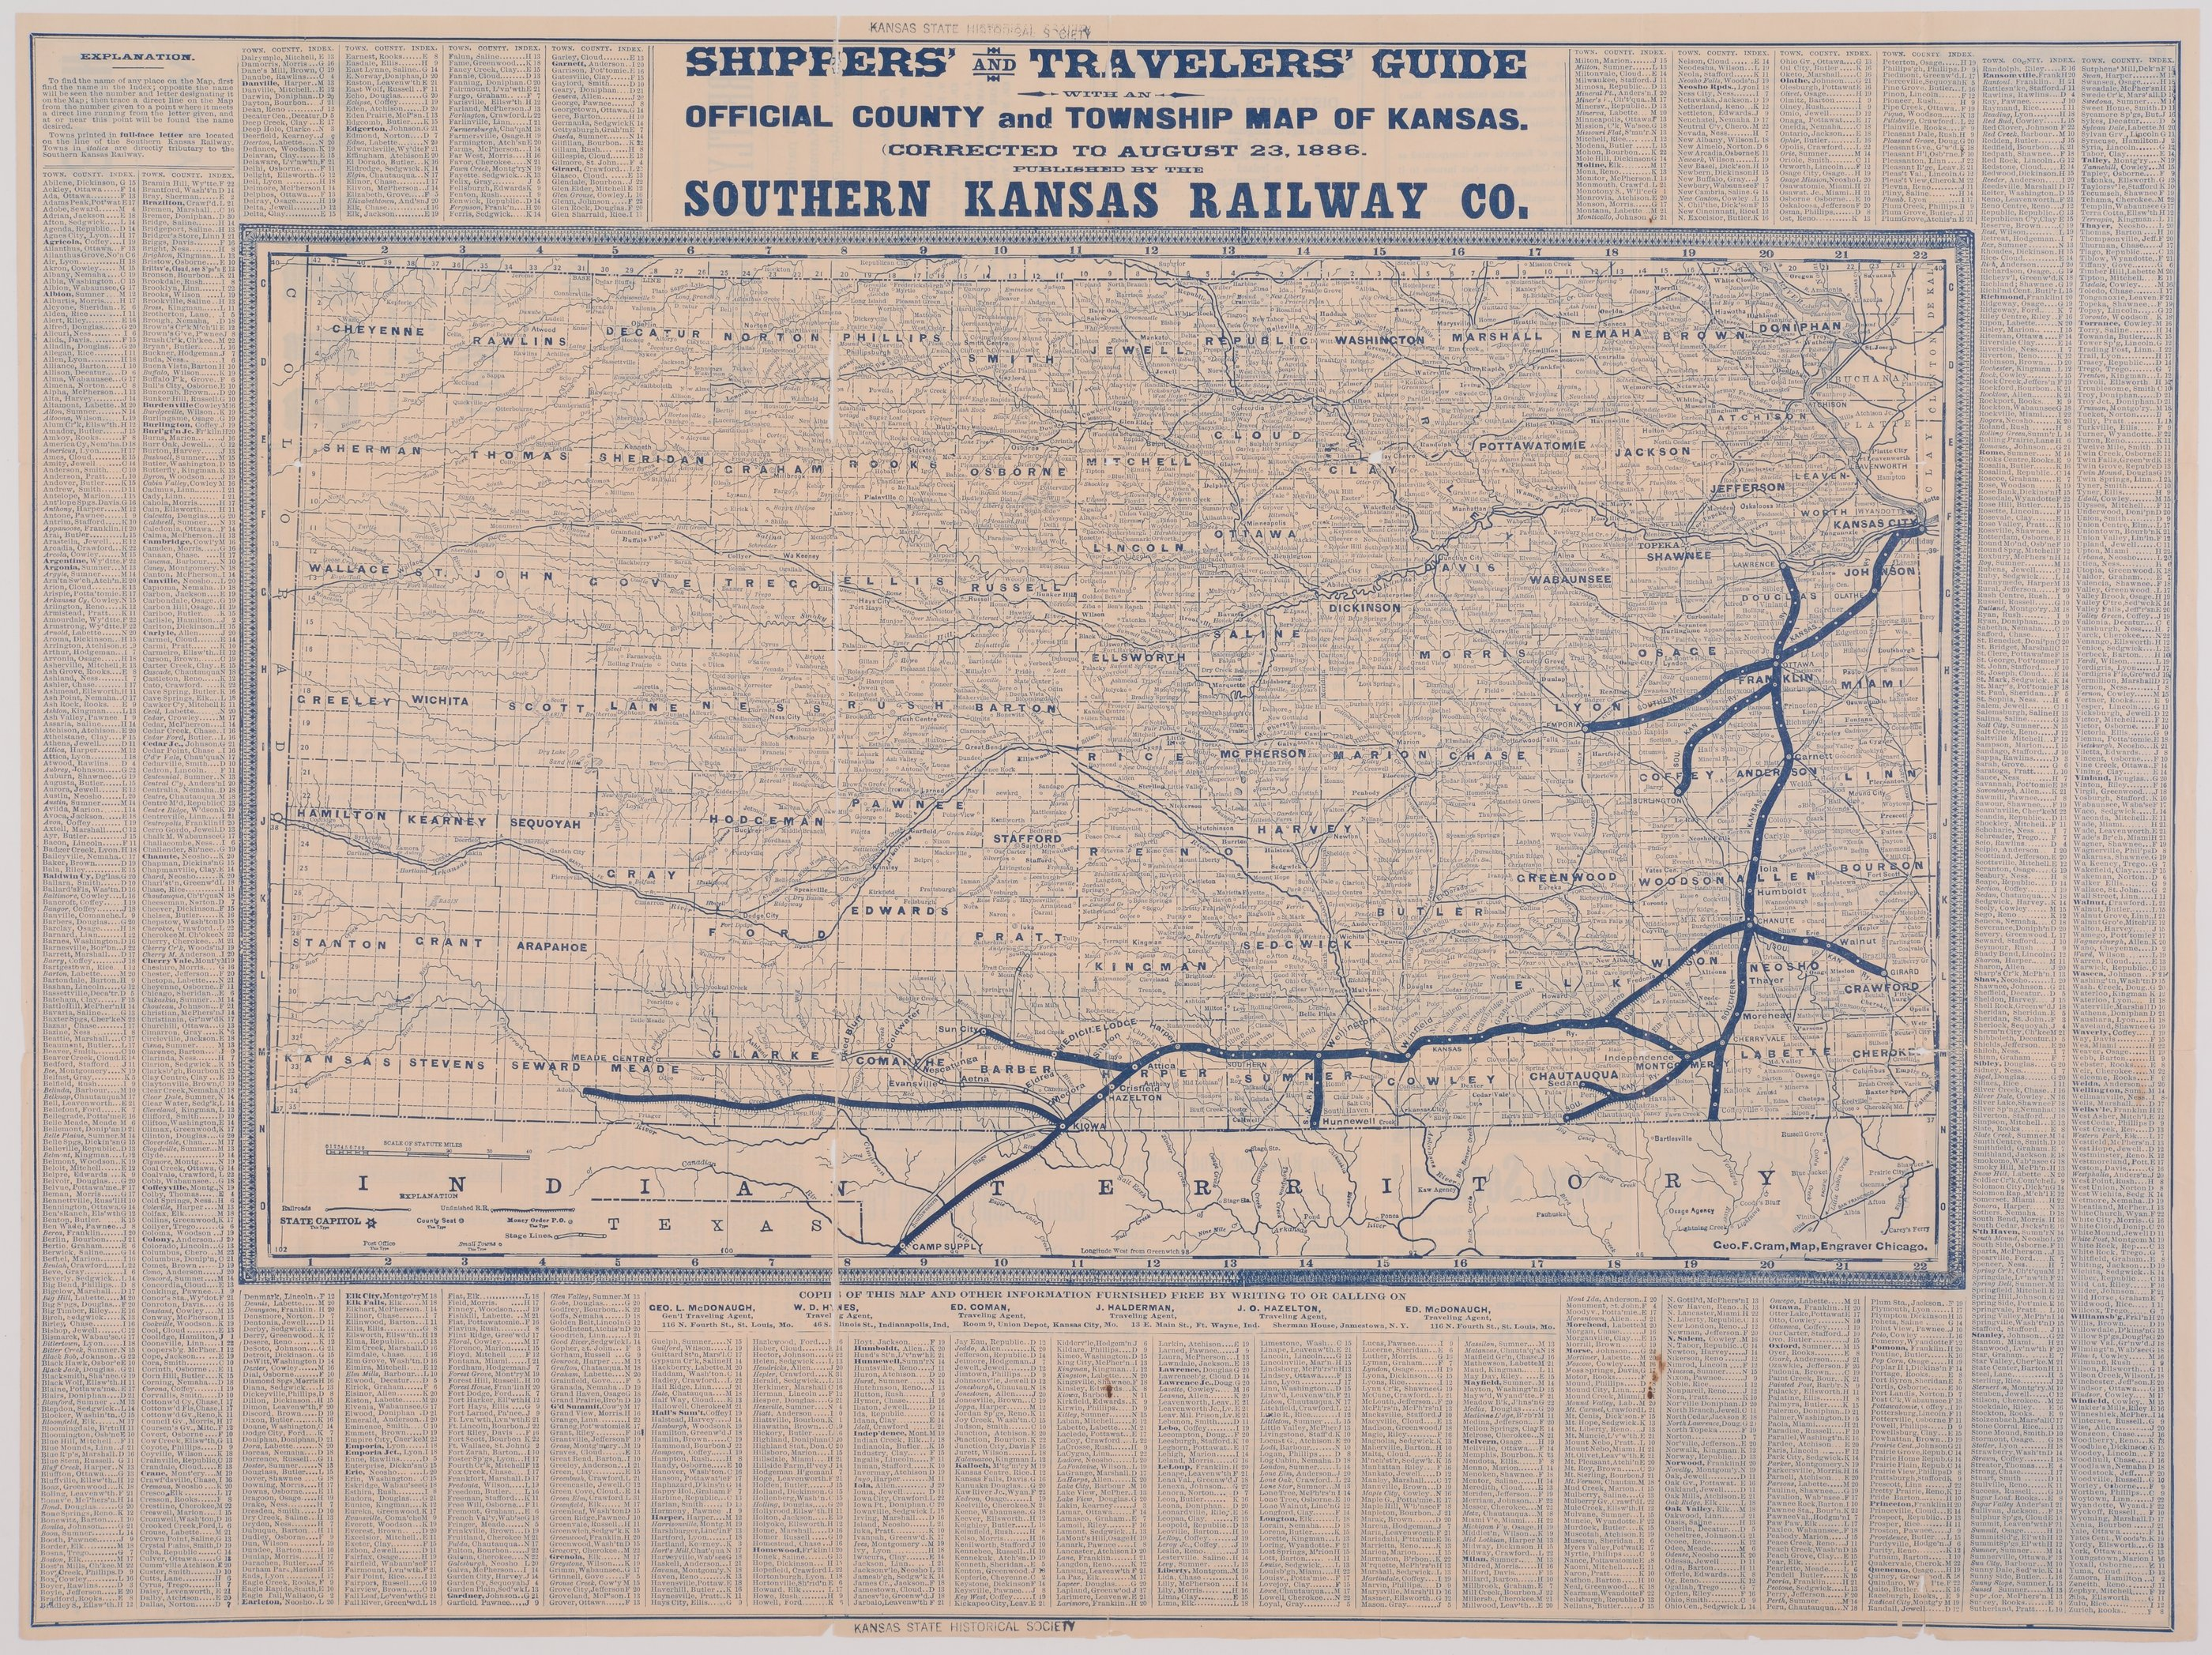 Southern Kansas Railway Company - 2